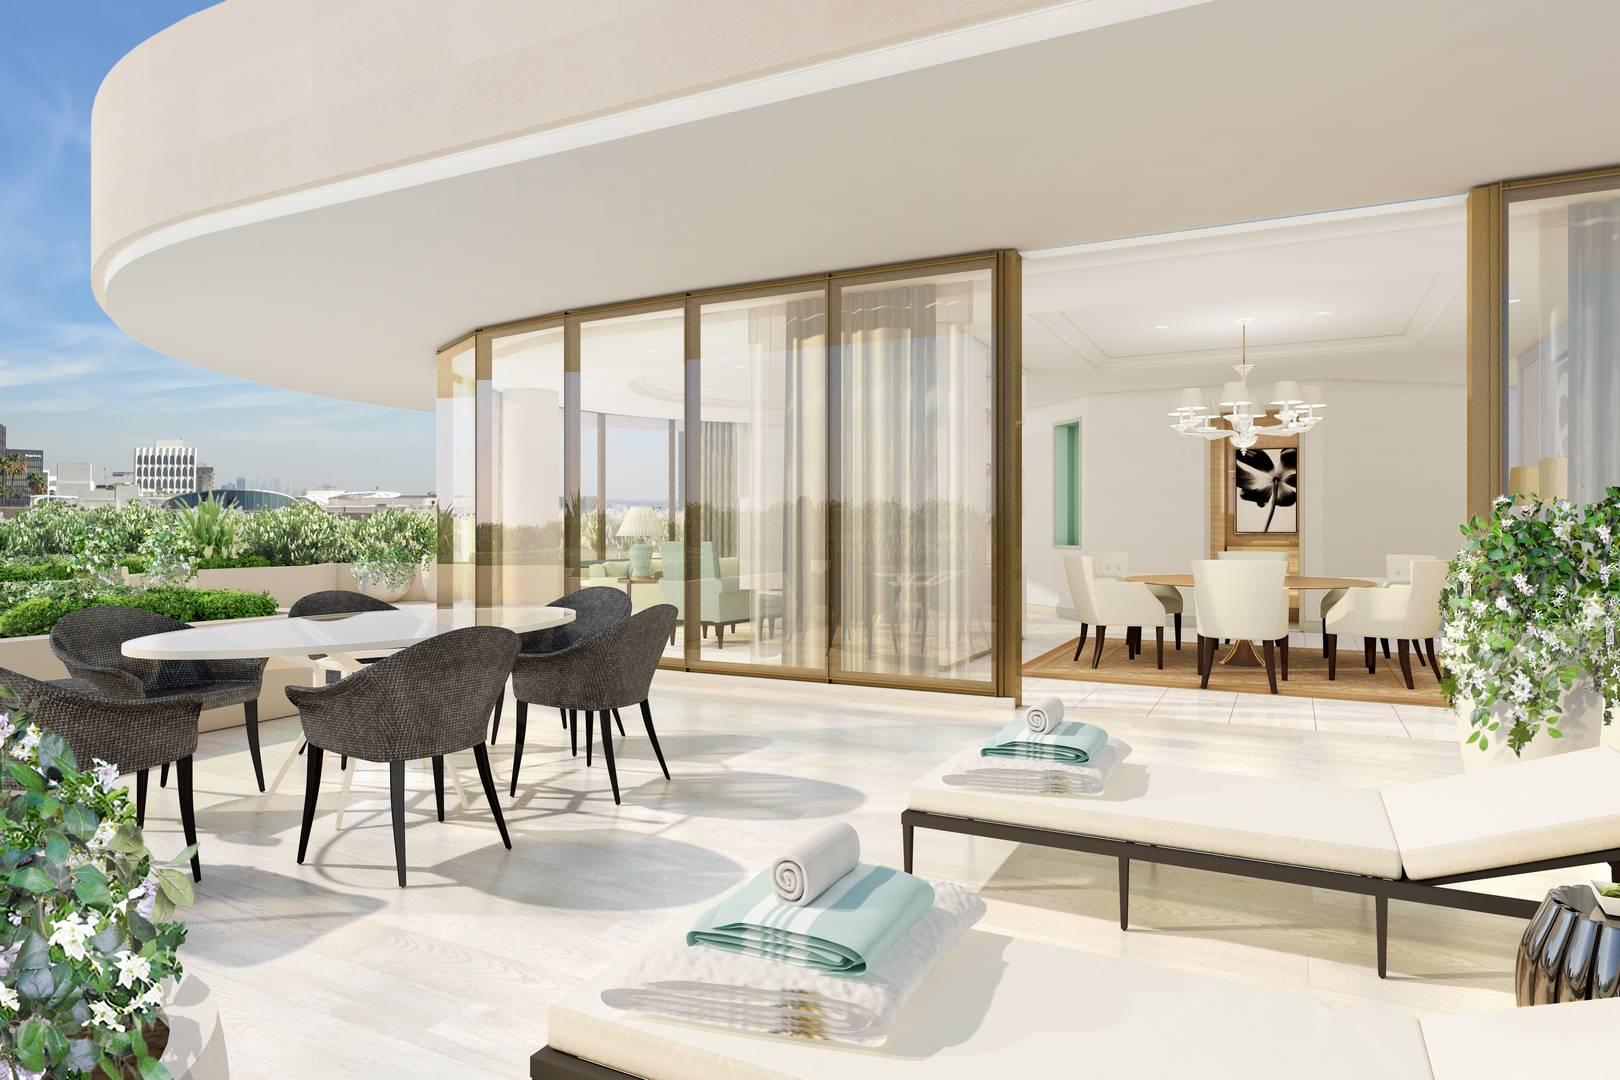 Waldorf astoria beverly hills opens gtspirit for 5 star restaurant exterior